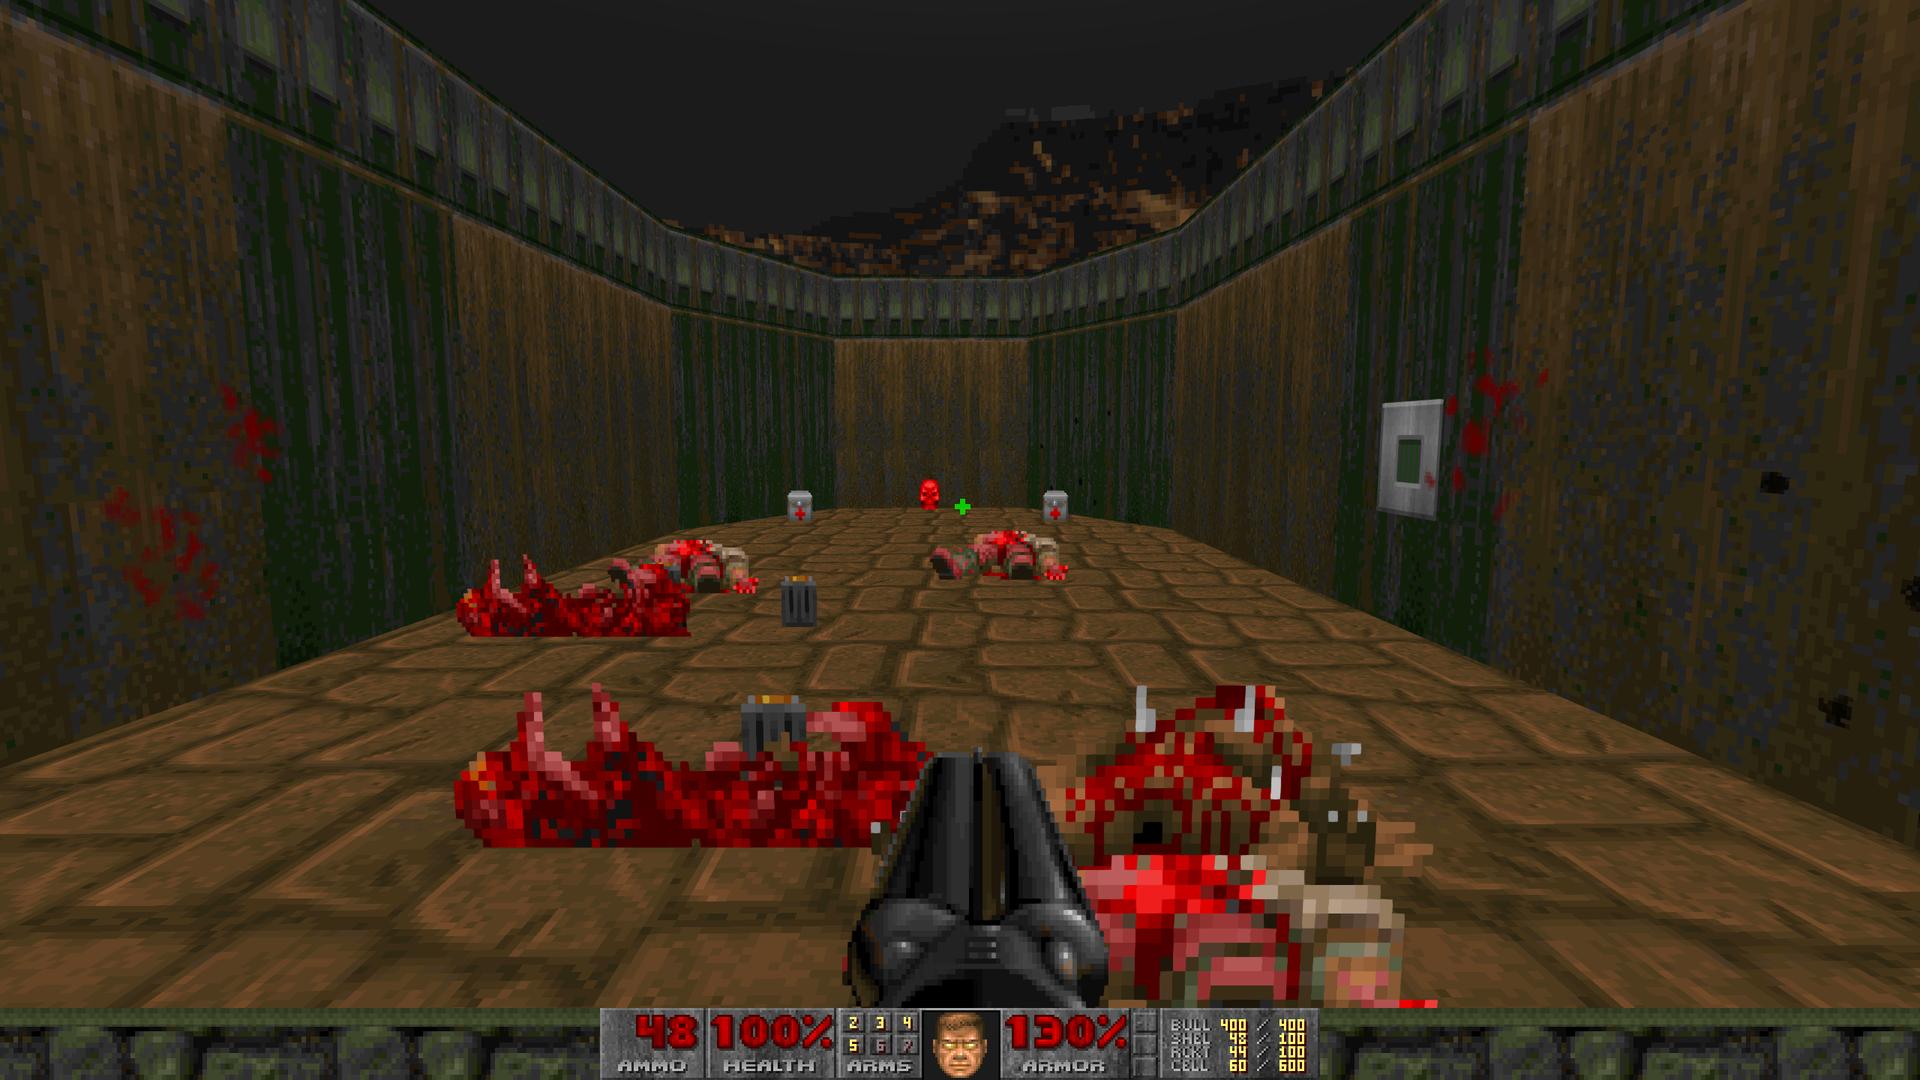 Screenshot_Doom_20210323_065848.png.4bd561117968499fbe4edf4ead4c30b4.png